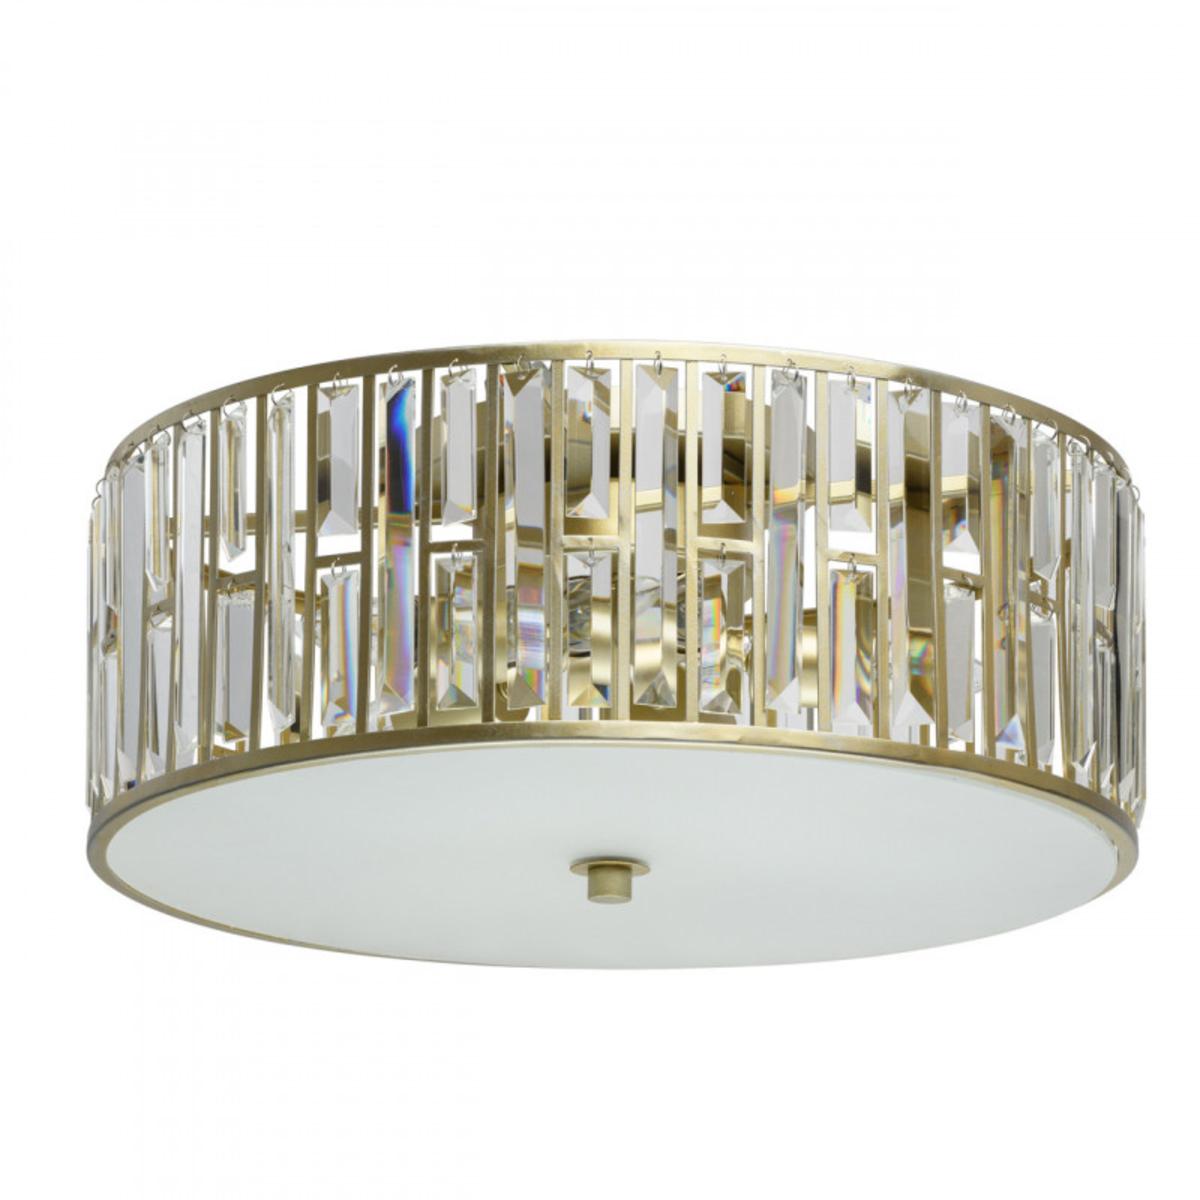 Купить Накладная люстра Монарх 121010205, HomeMe